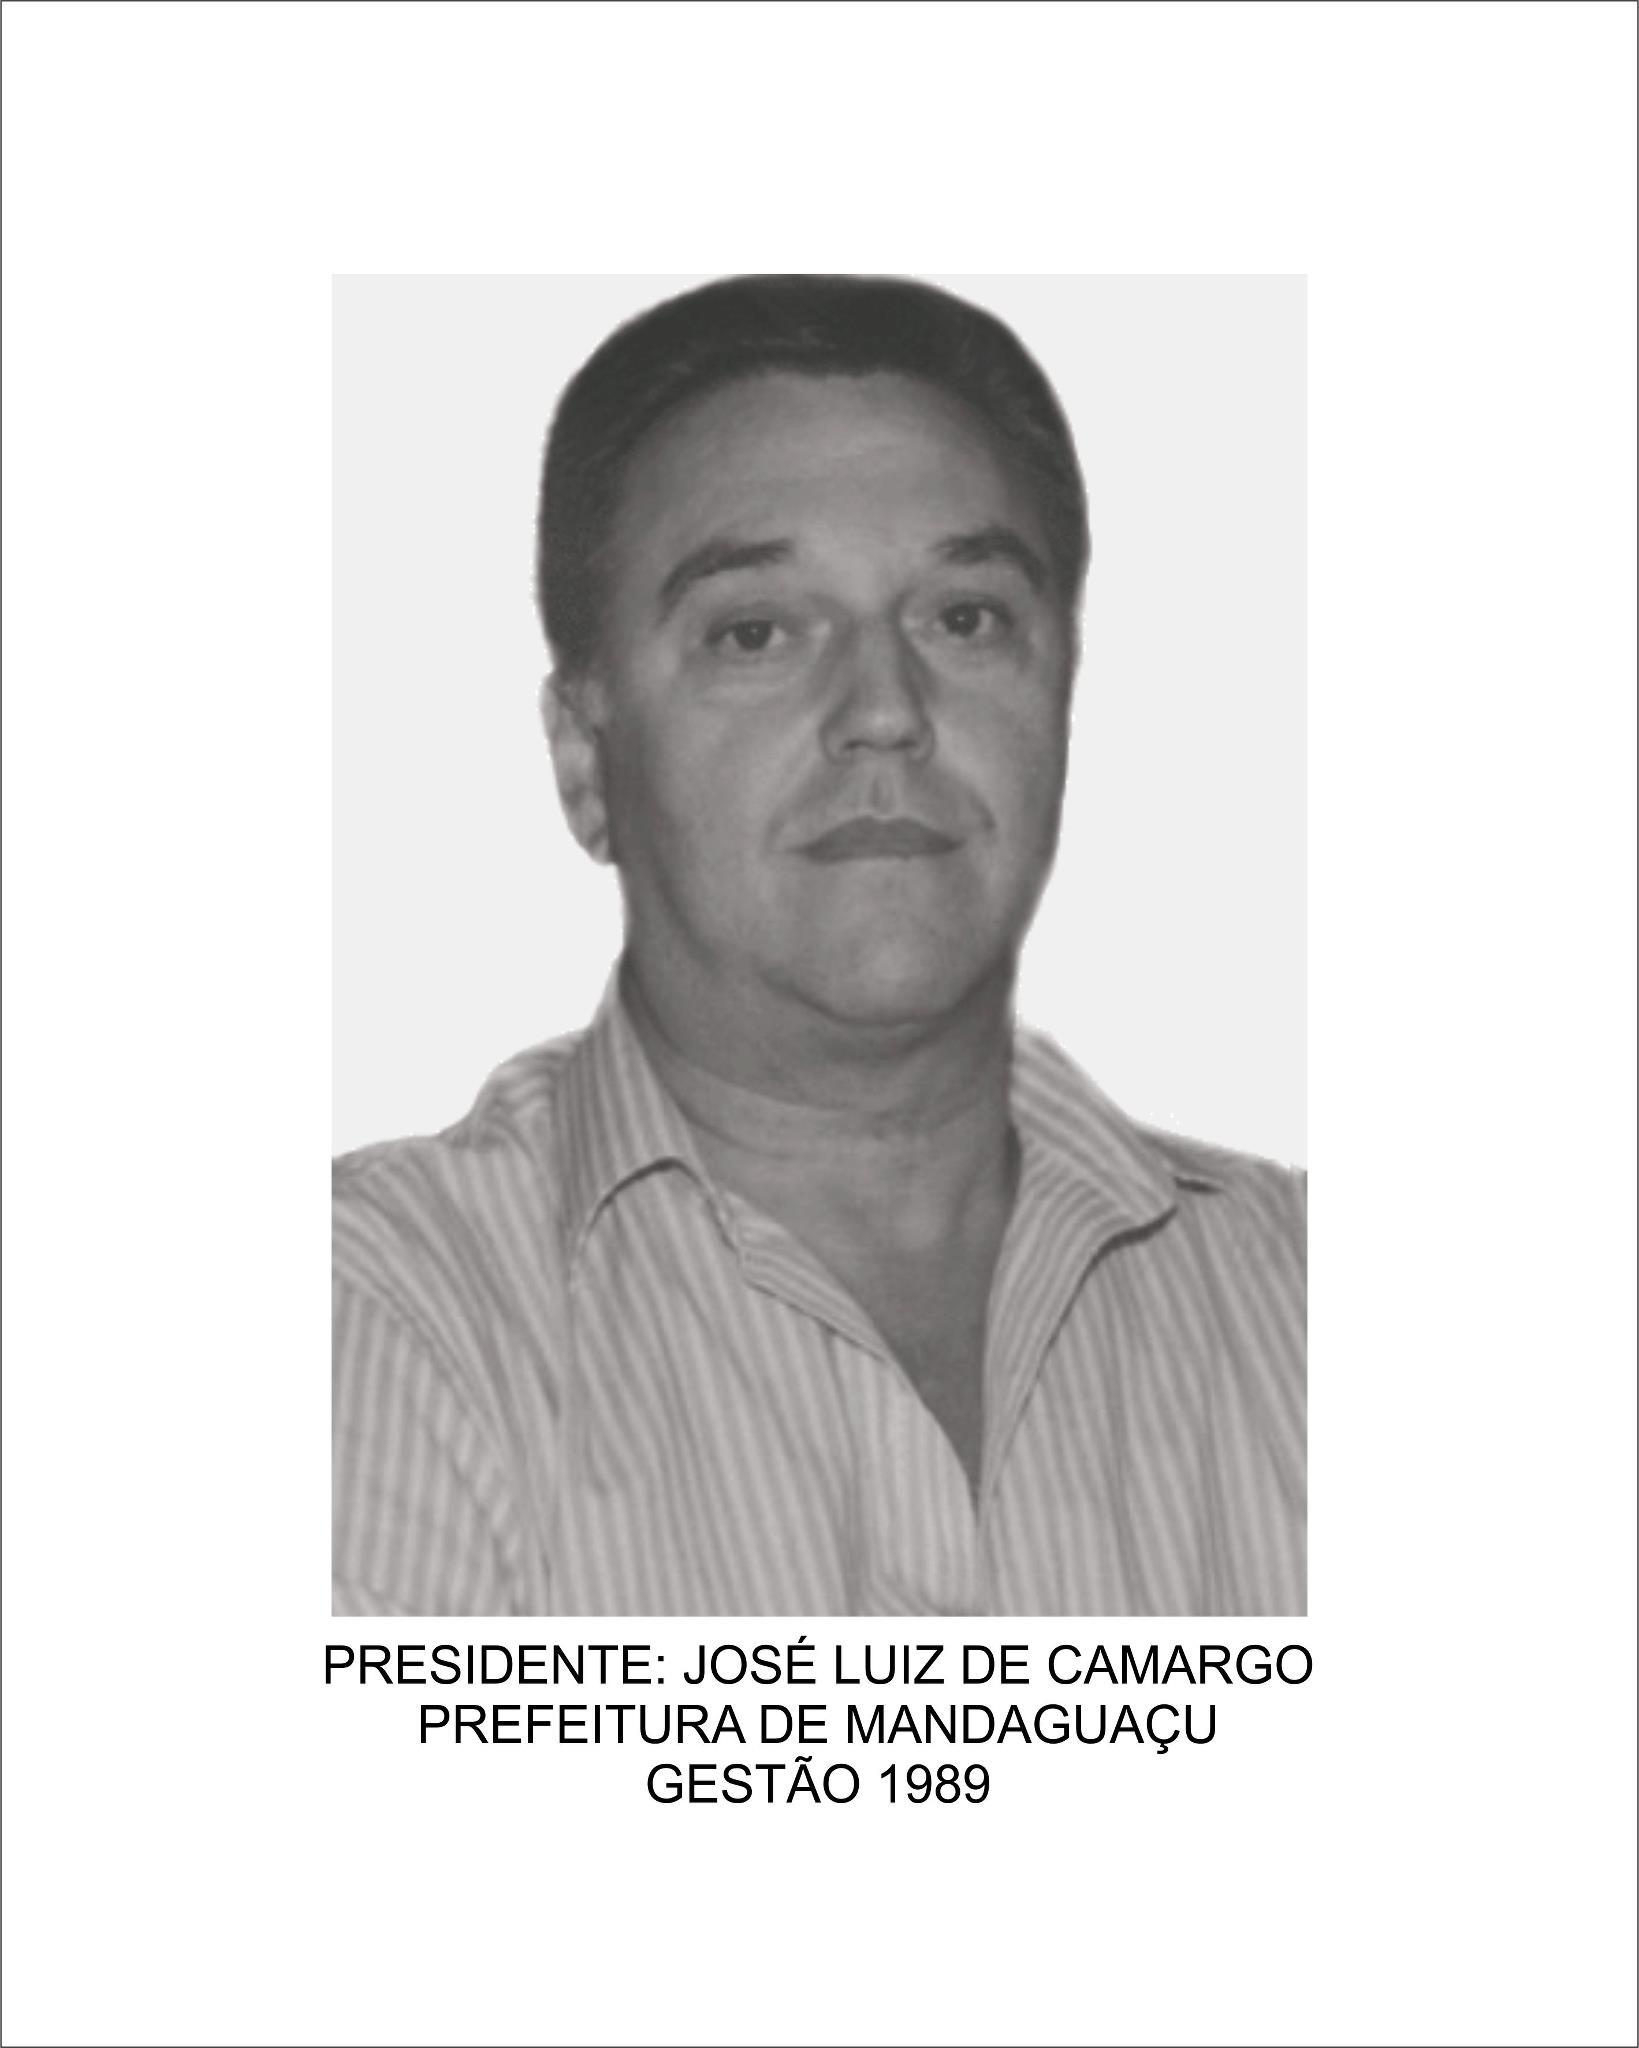 José Luiz de Camargo